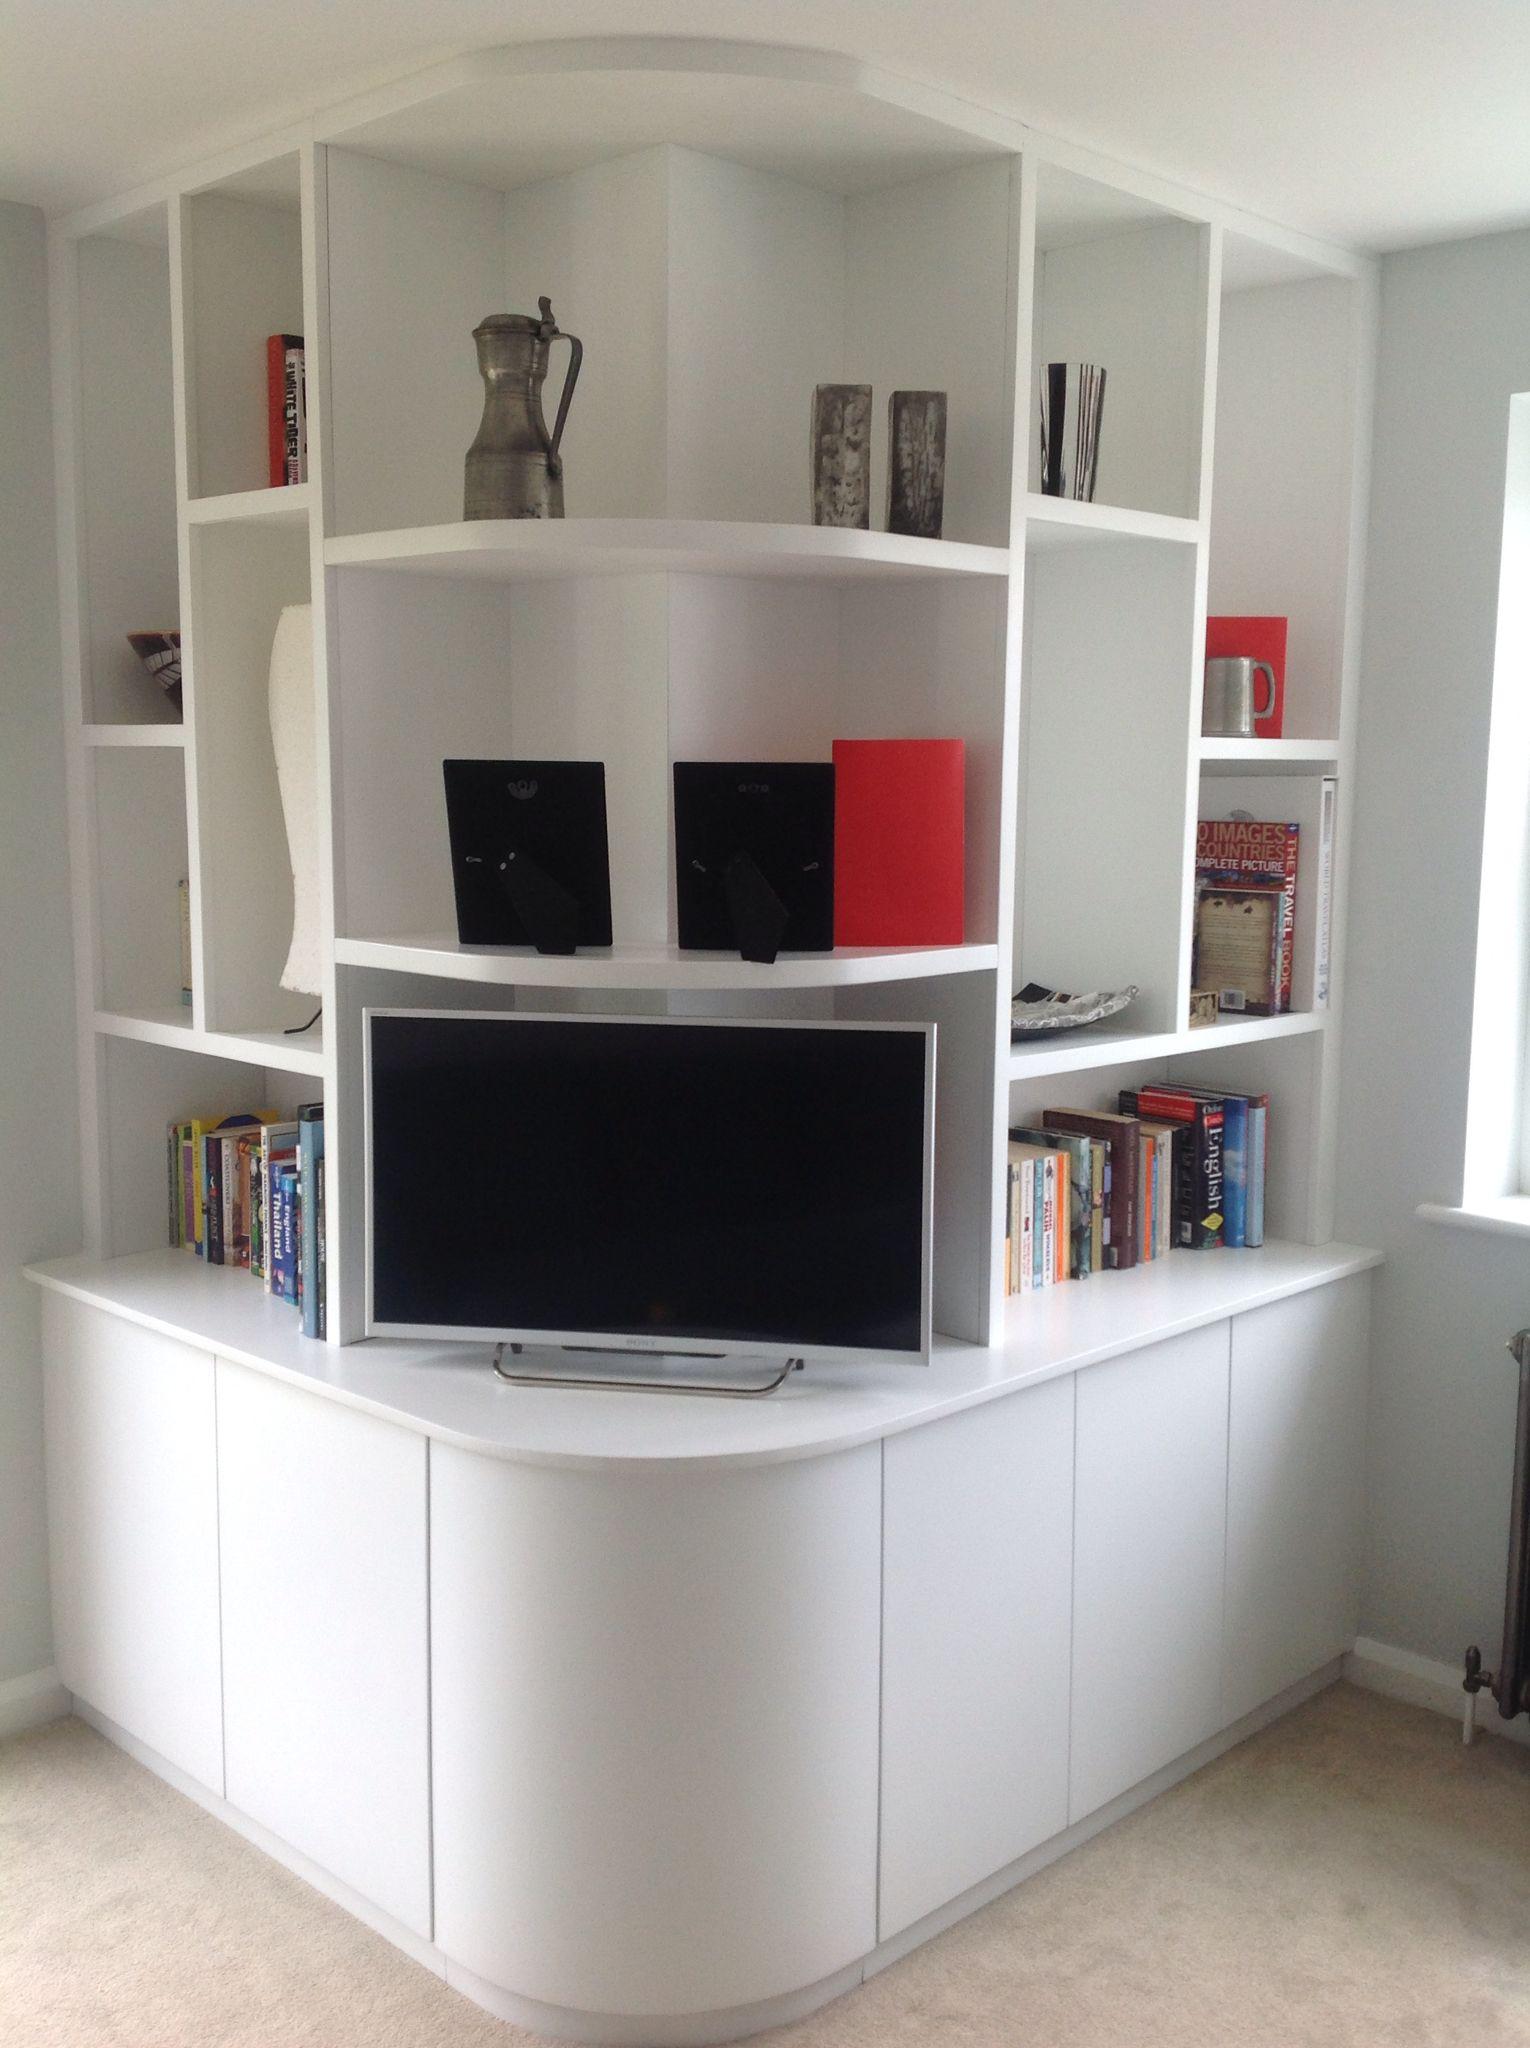 Our new custom built external corner shelving unit we are loving it